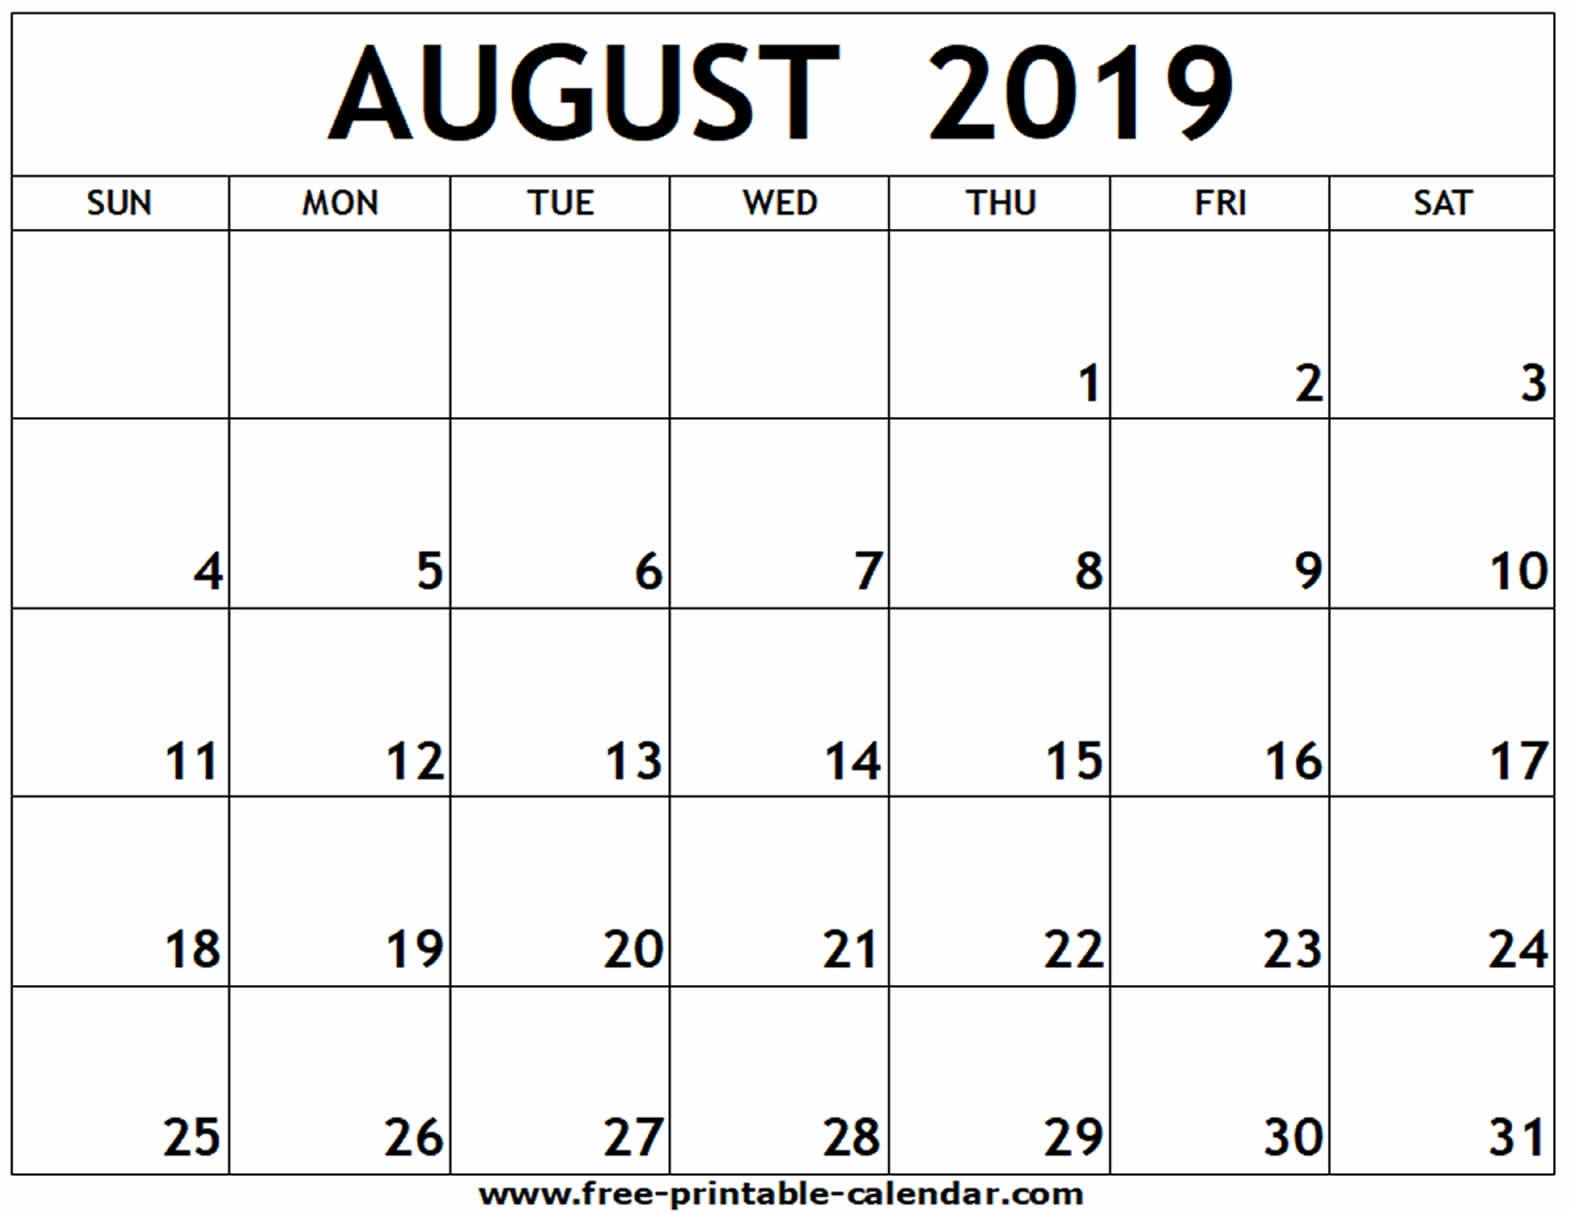 August 2019 Printable Calendar - Free-Printable-Calendar